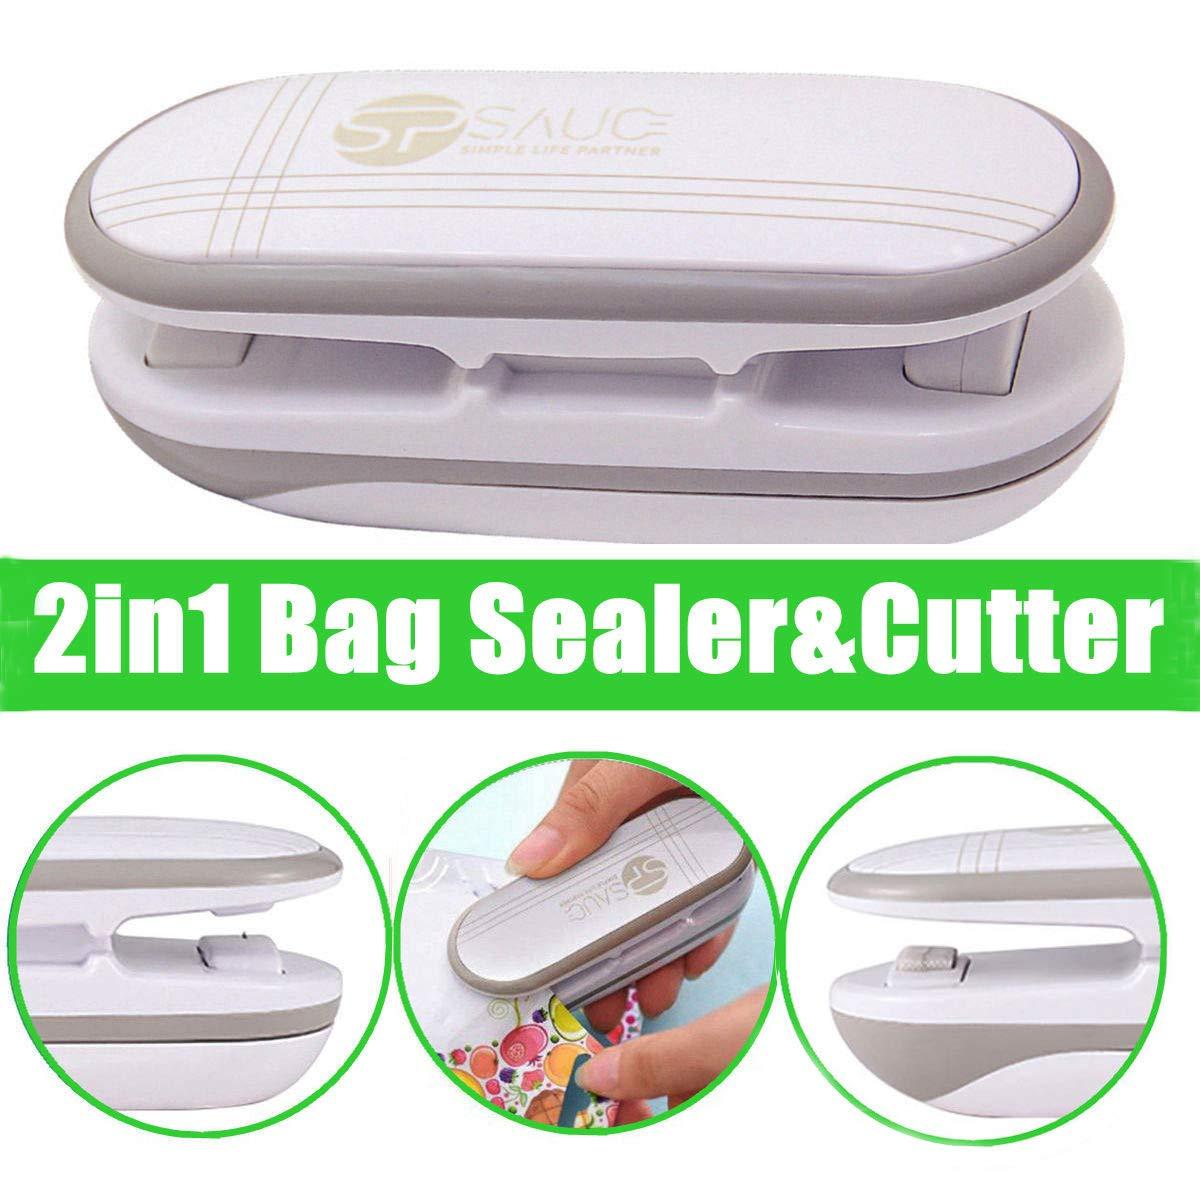 Mini Bag Sealer, Ariskey 2 in 1 Heat Sealer and Cutter Handheld Portable Bag Resealer Sealer for Plastic Bags Food Storage Snack Fresh Bag Sealer or Chip Saver (Battery Not Included)-White by ARISKEY